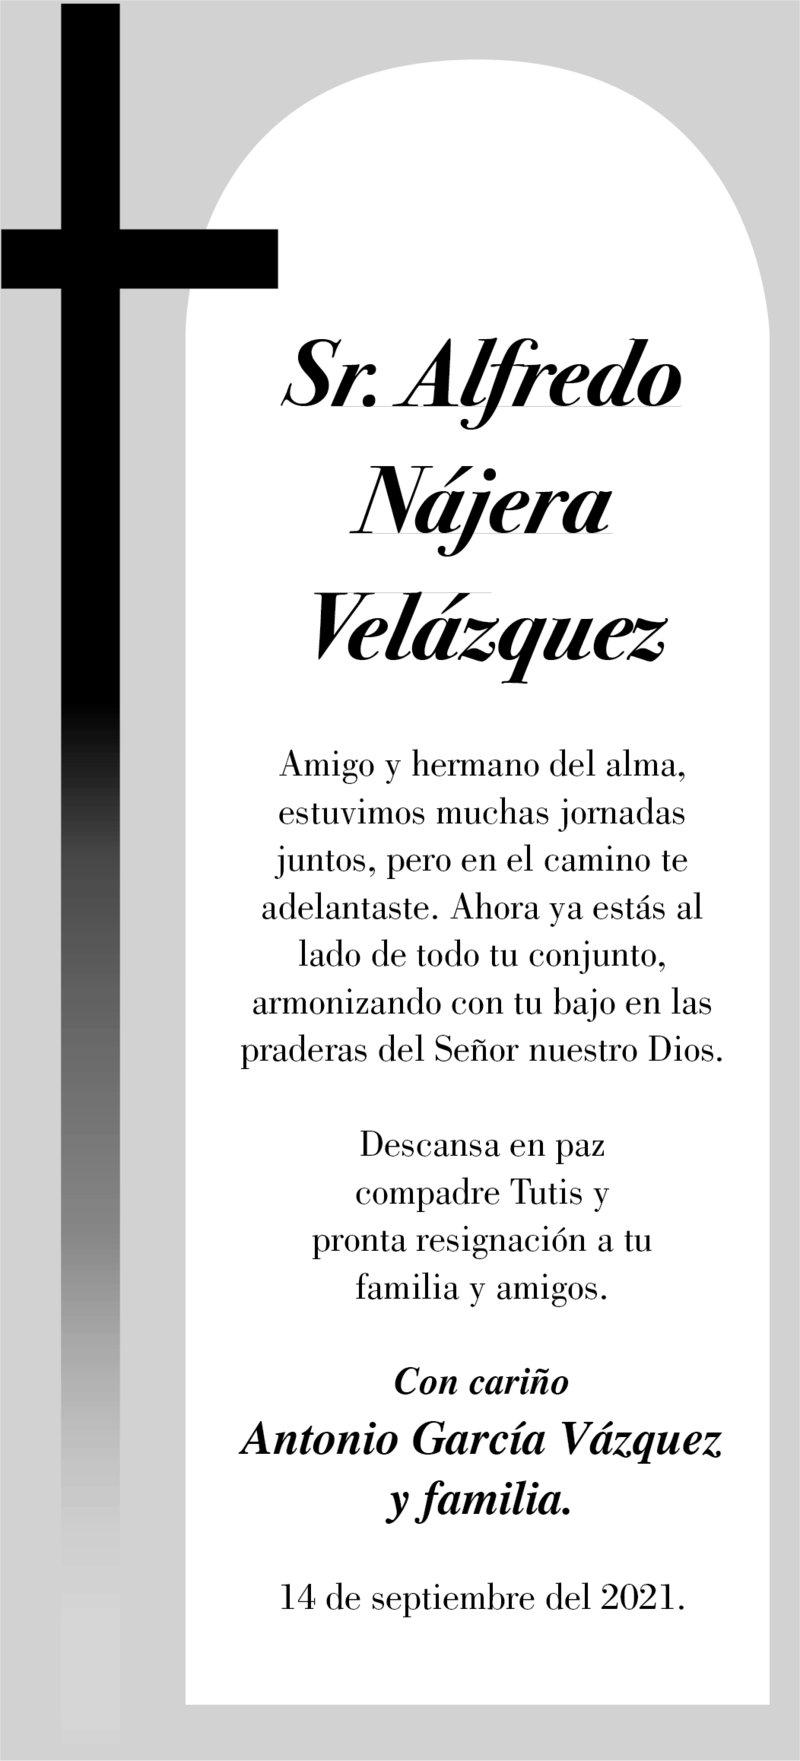 CONDOLENCIA: SR. ALFREDO NÁJERA VELÁZQUEZ.